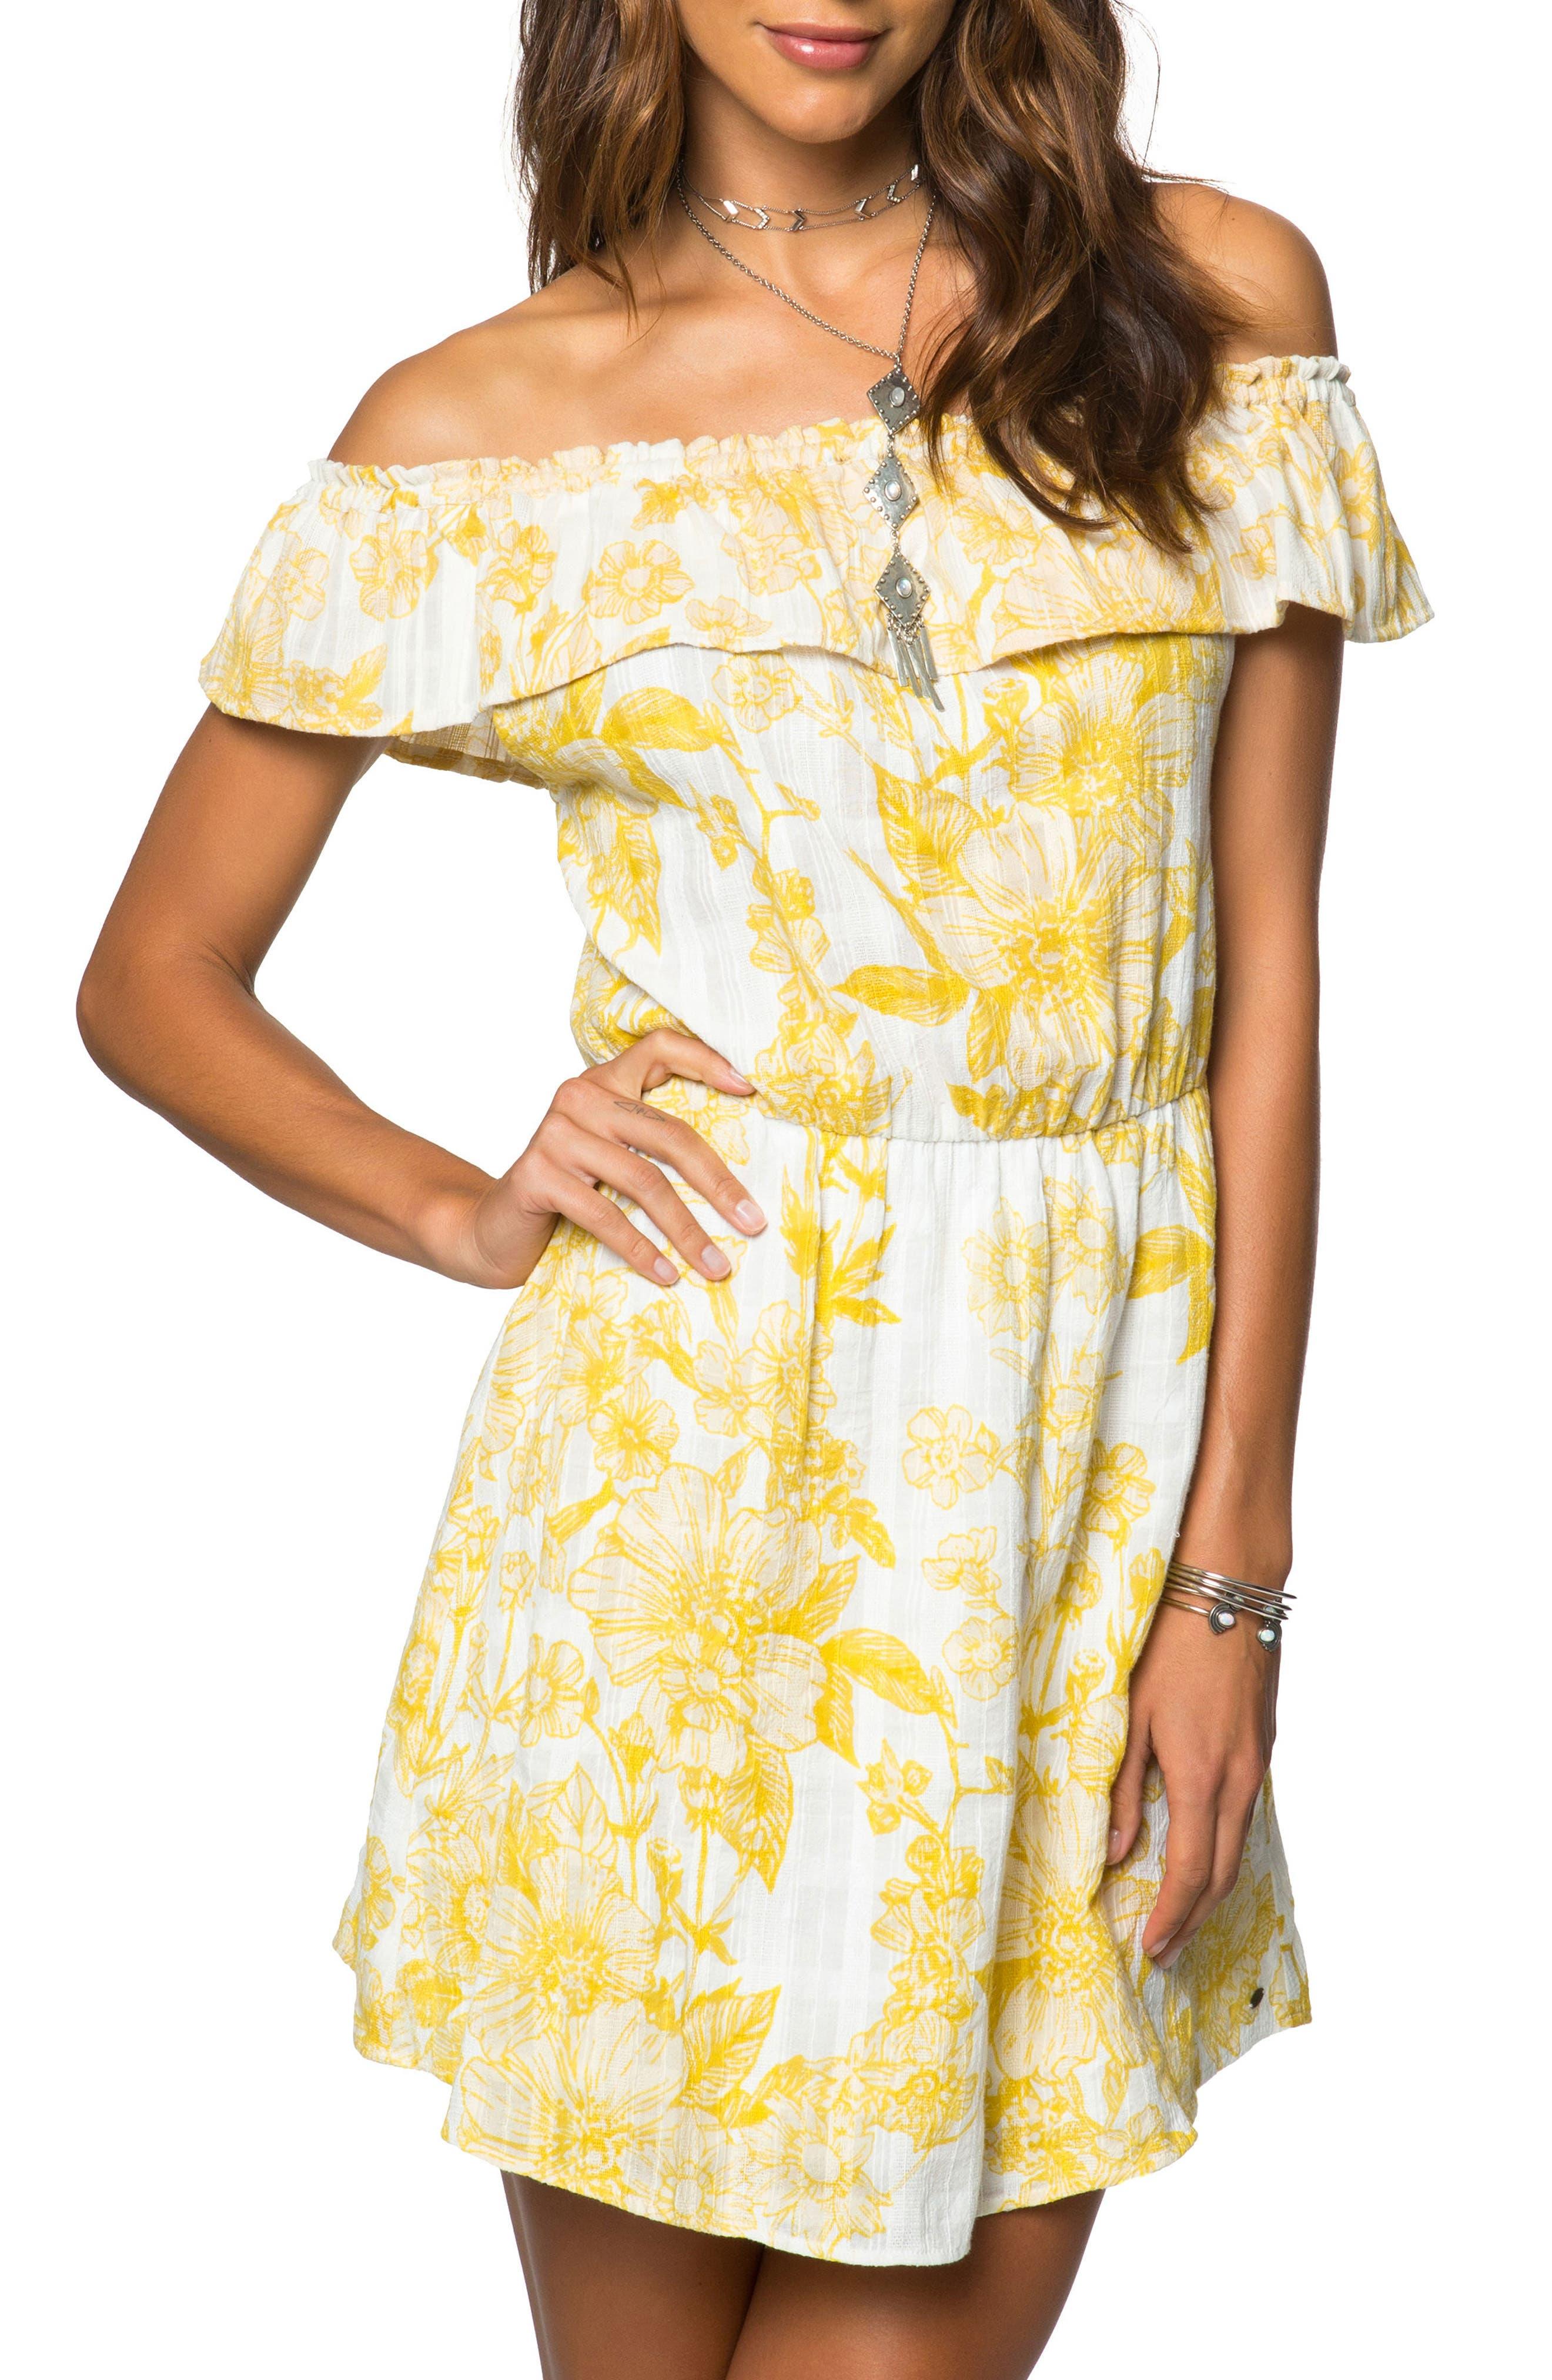 Dorothy Floral Off the Shoulder Dress,                             Main thumbnail 1, color,                             700